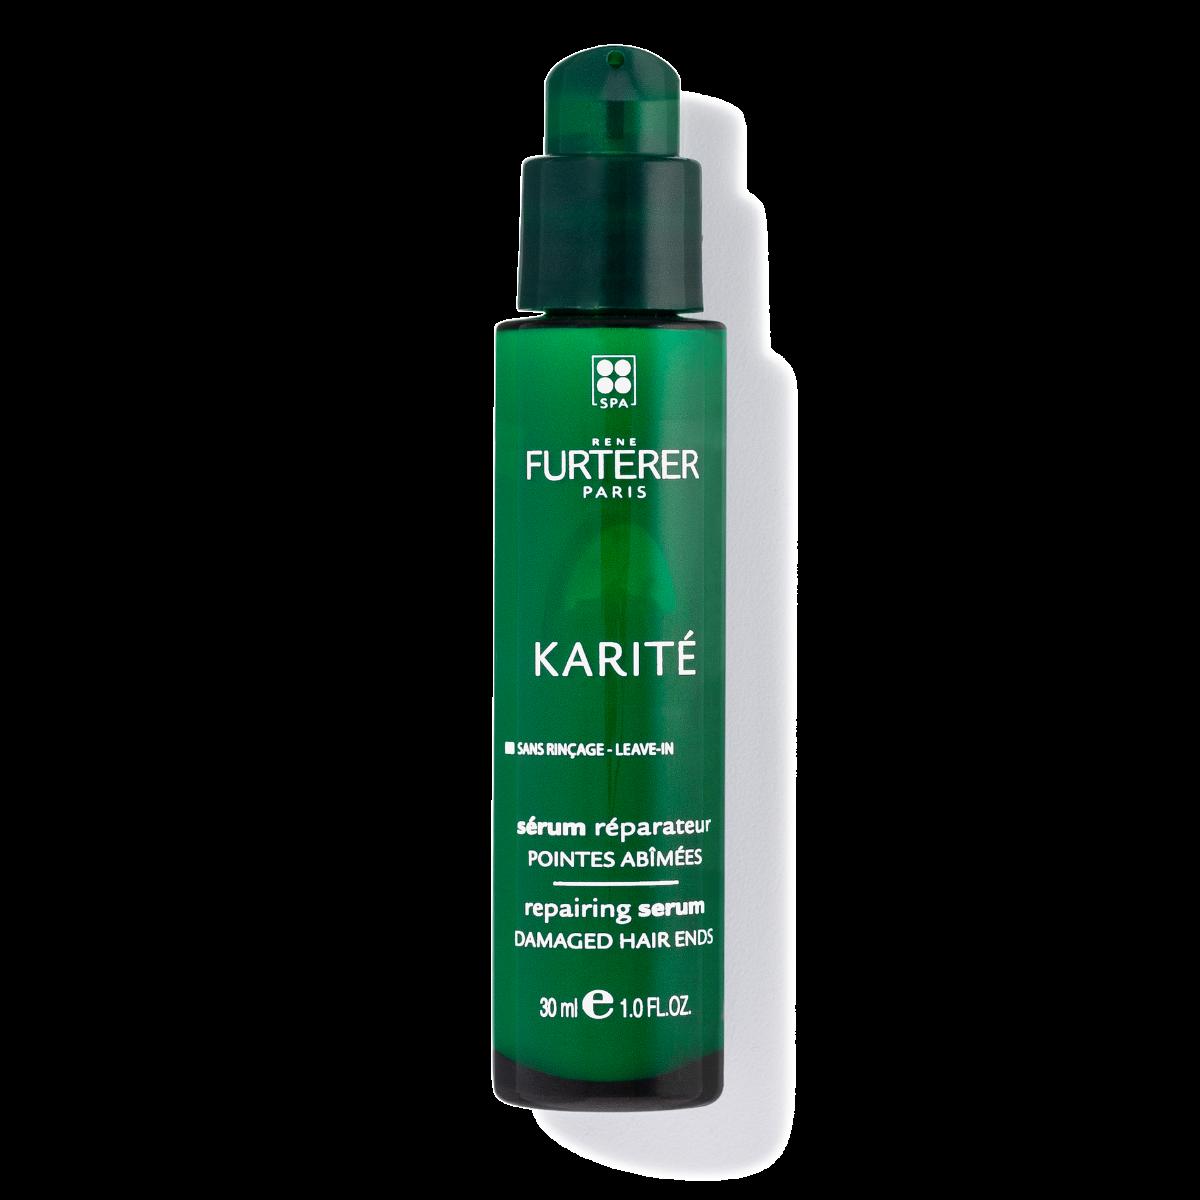 Rene Furterer KARITÉ Nutri Repairing Serum